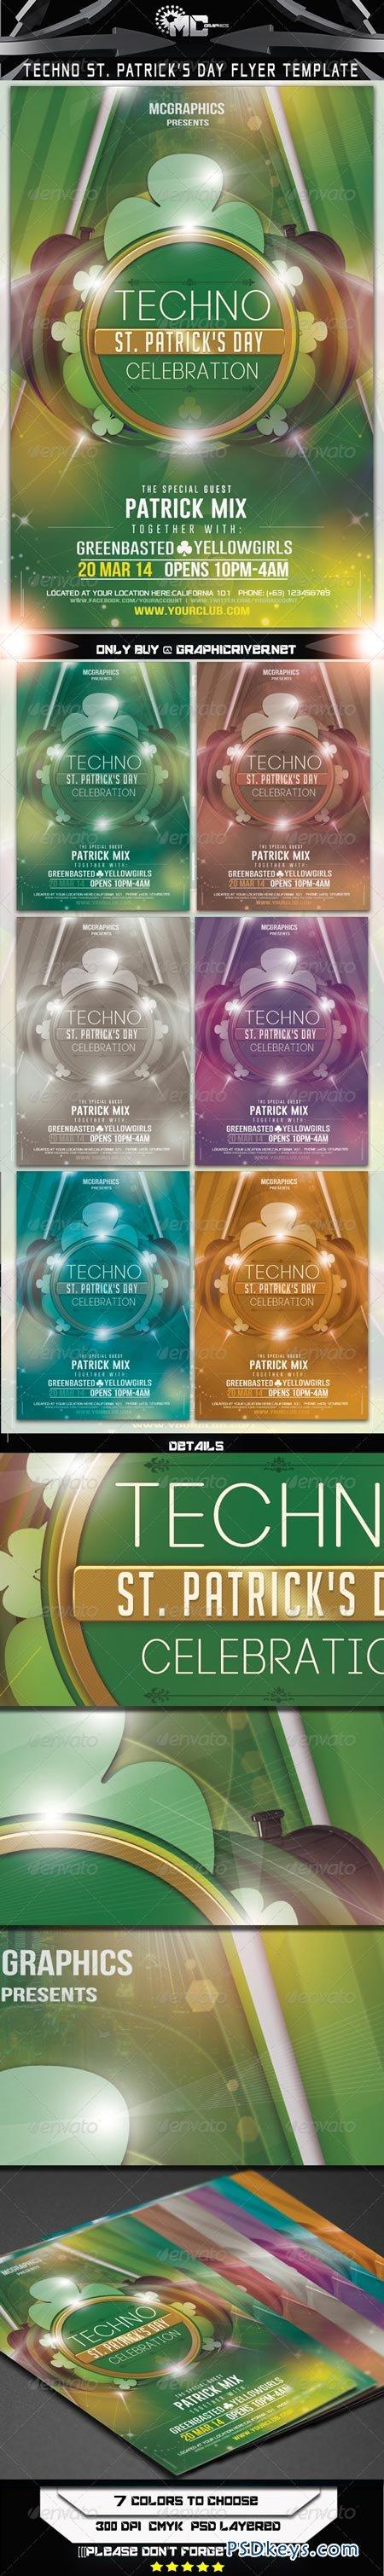 Techno St. Patrick's Day Flyer Template 6899142